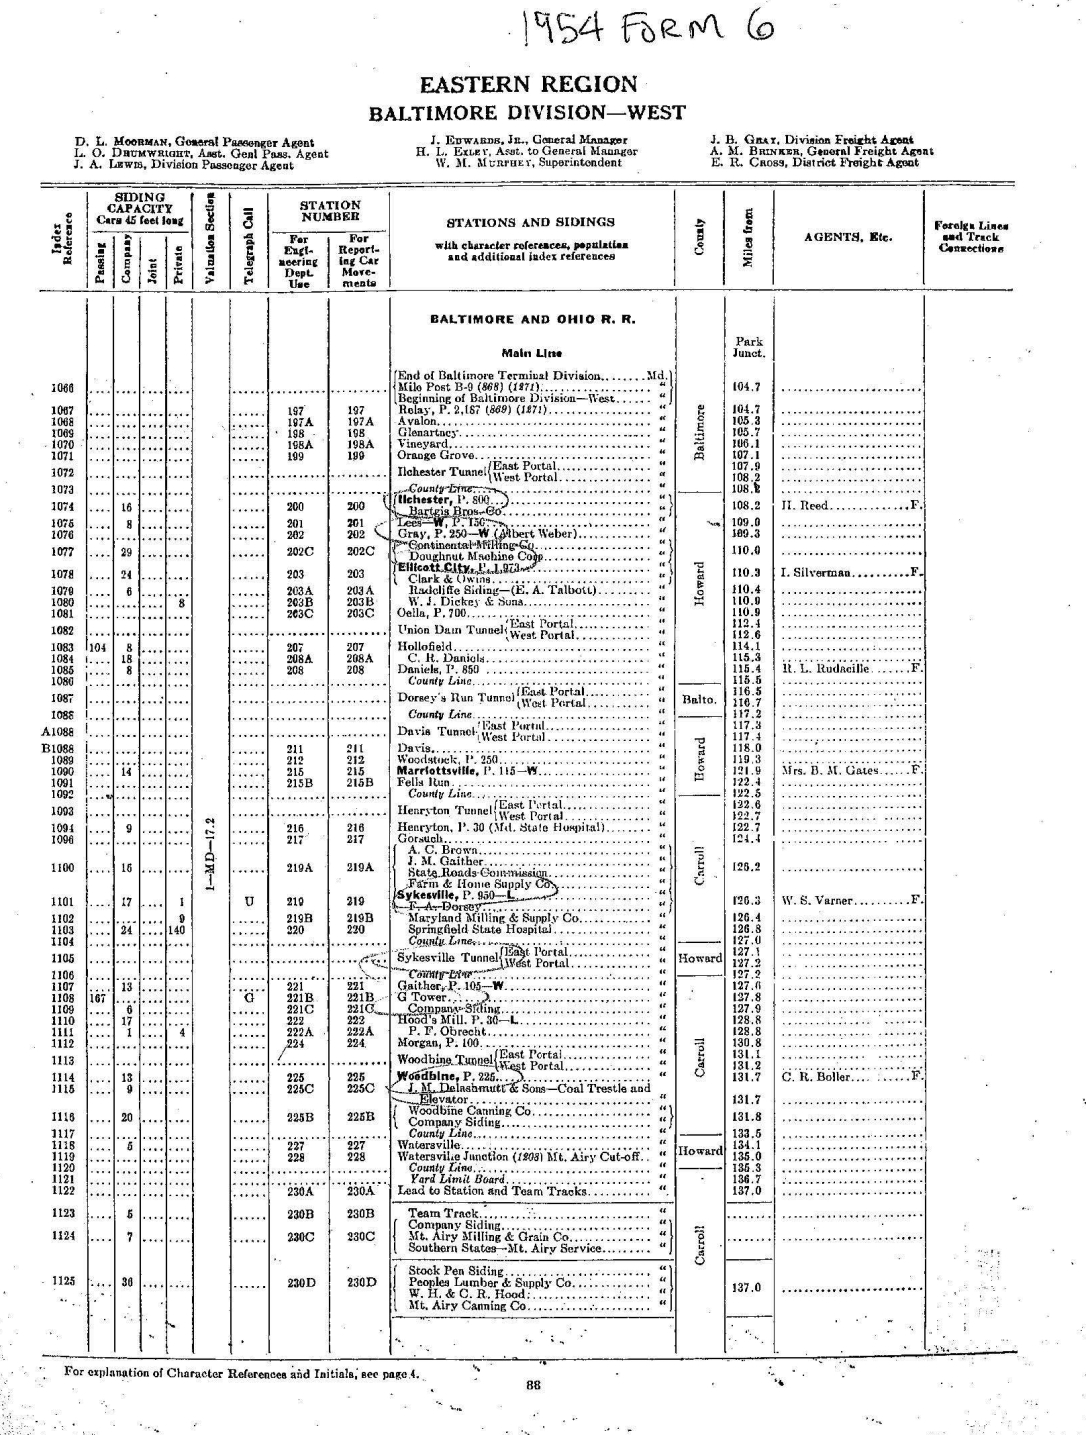 1954-bo-form-6-oml-1st-page1.jpg